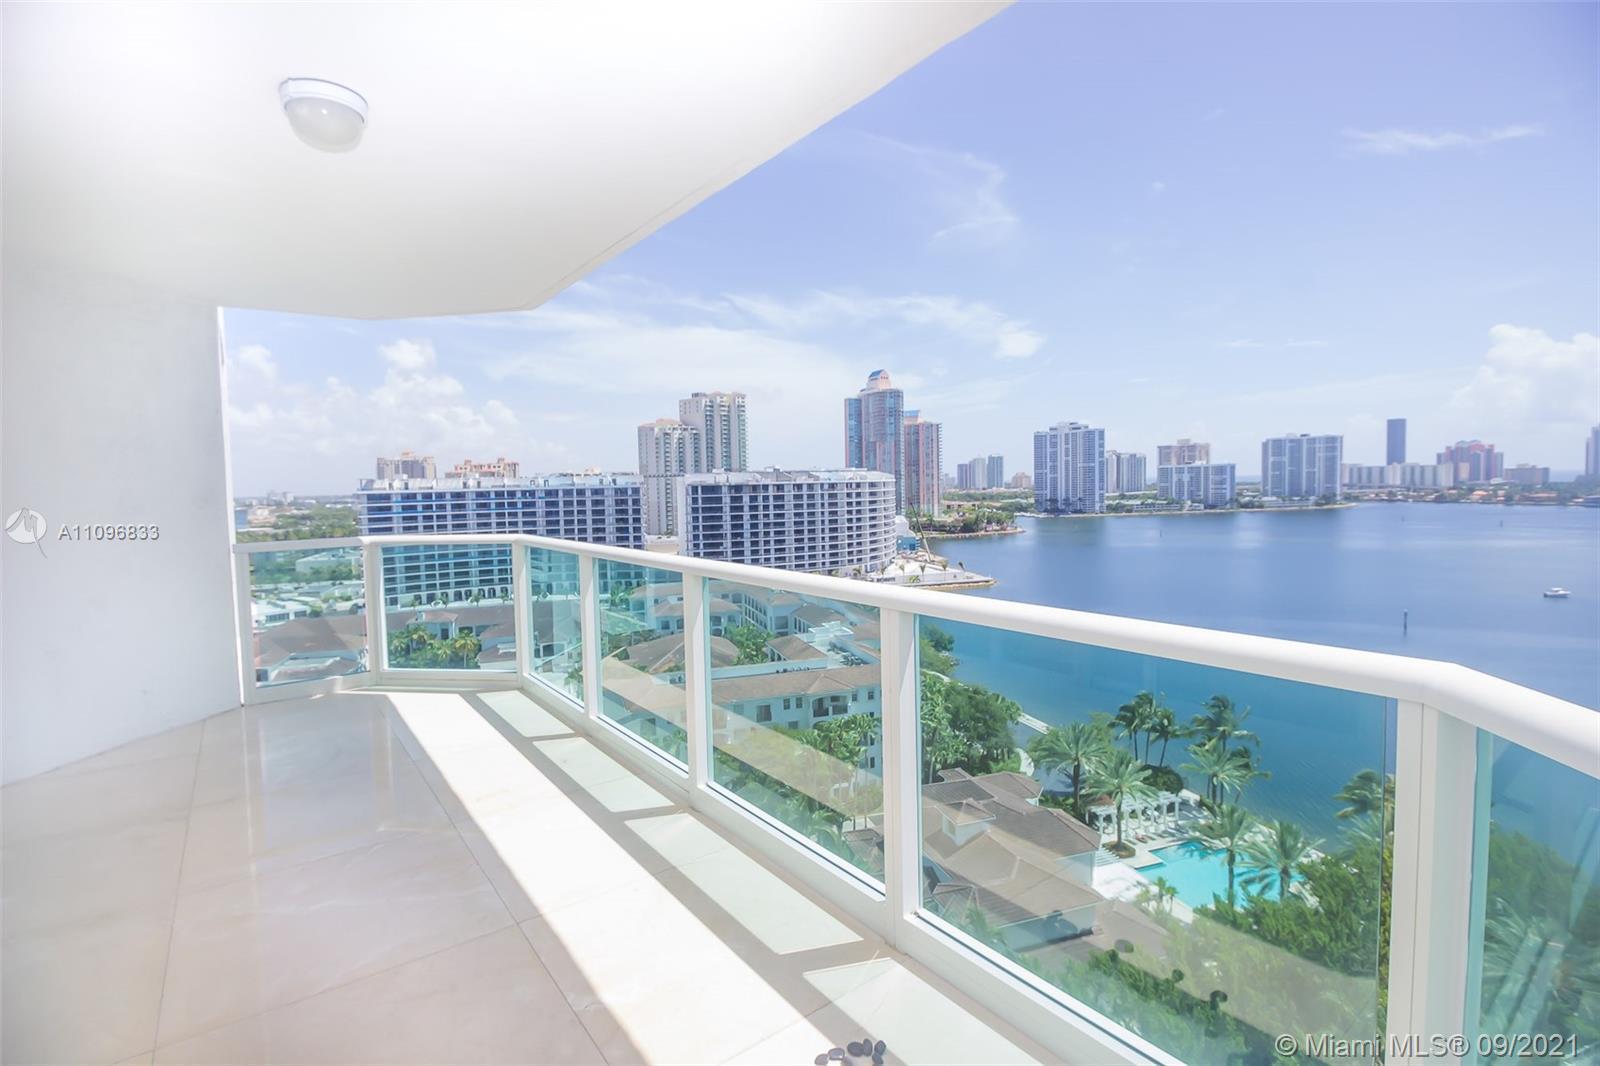 Luxury Corner unit  4 bedrooms, 4 and a half bathroom plus Den. Fabulous direct Ocean Intracoastal a